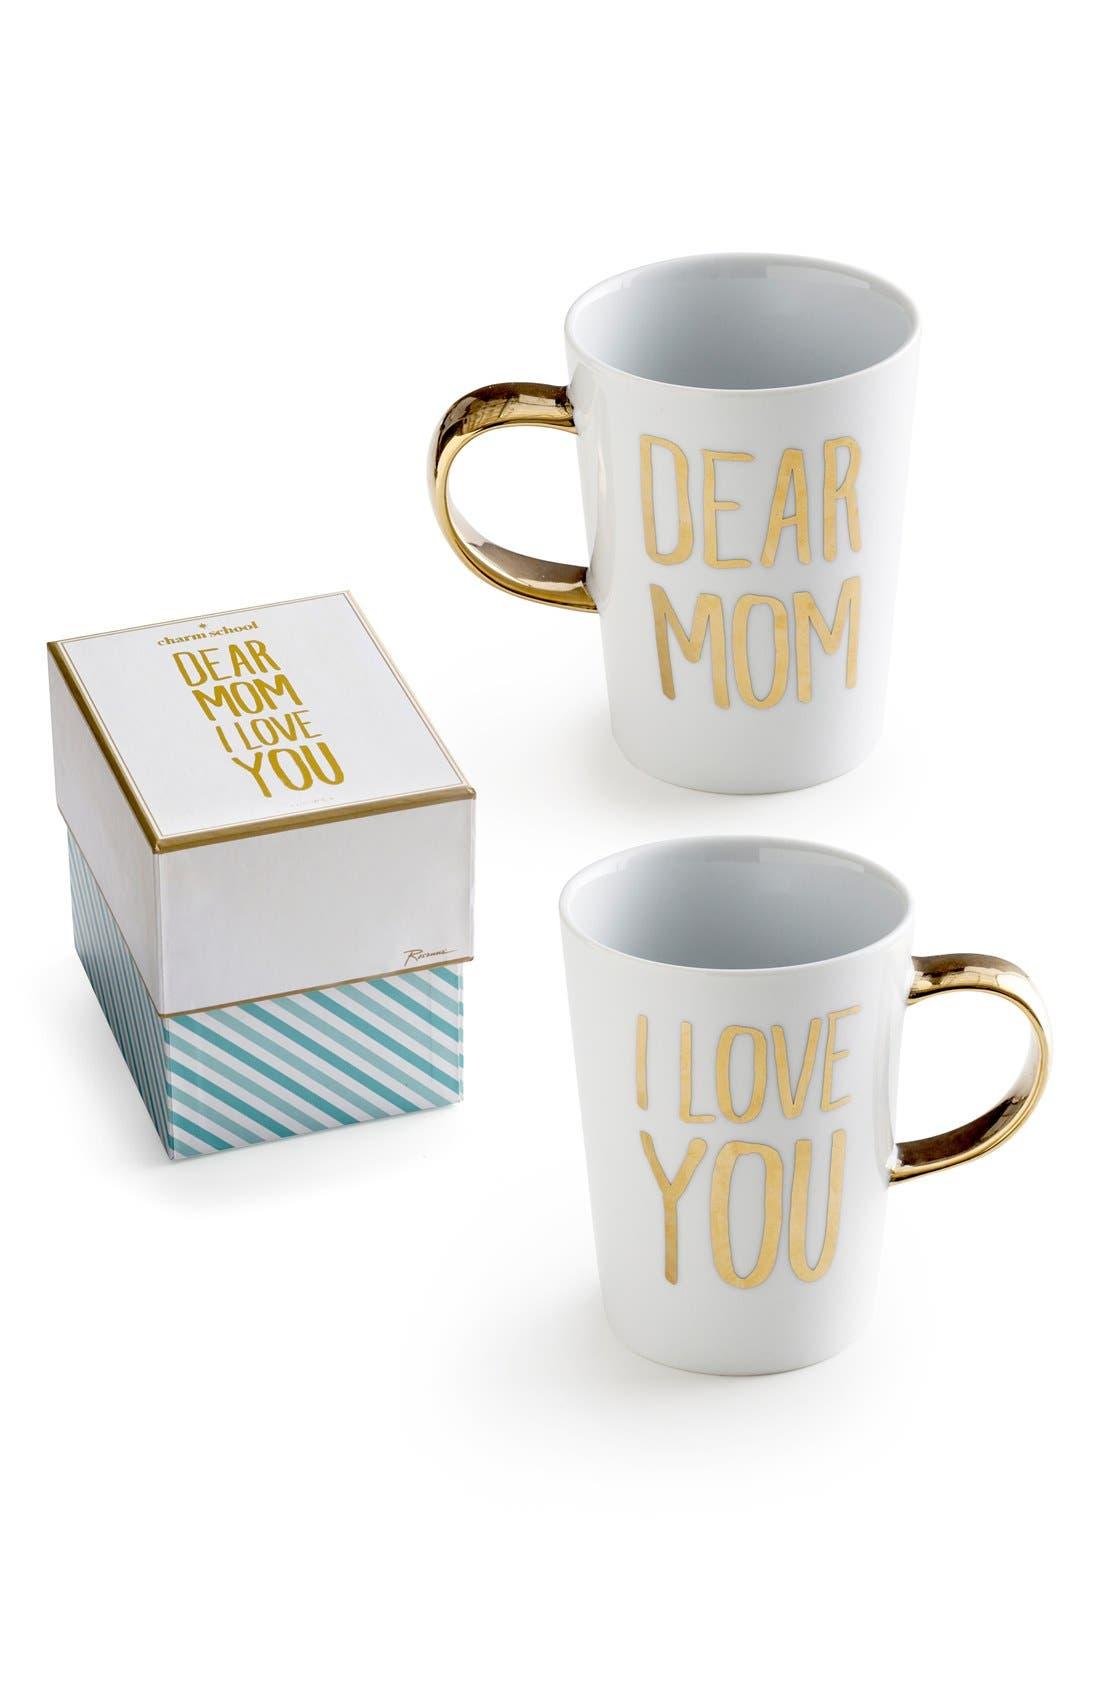 Alternate Image 1 Selected - Rosanna 'Dear Mom I Love You' Porcelain Coffee Mug